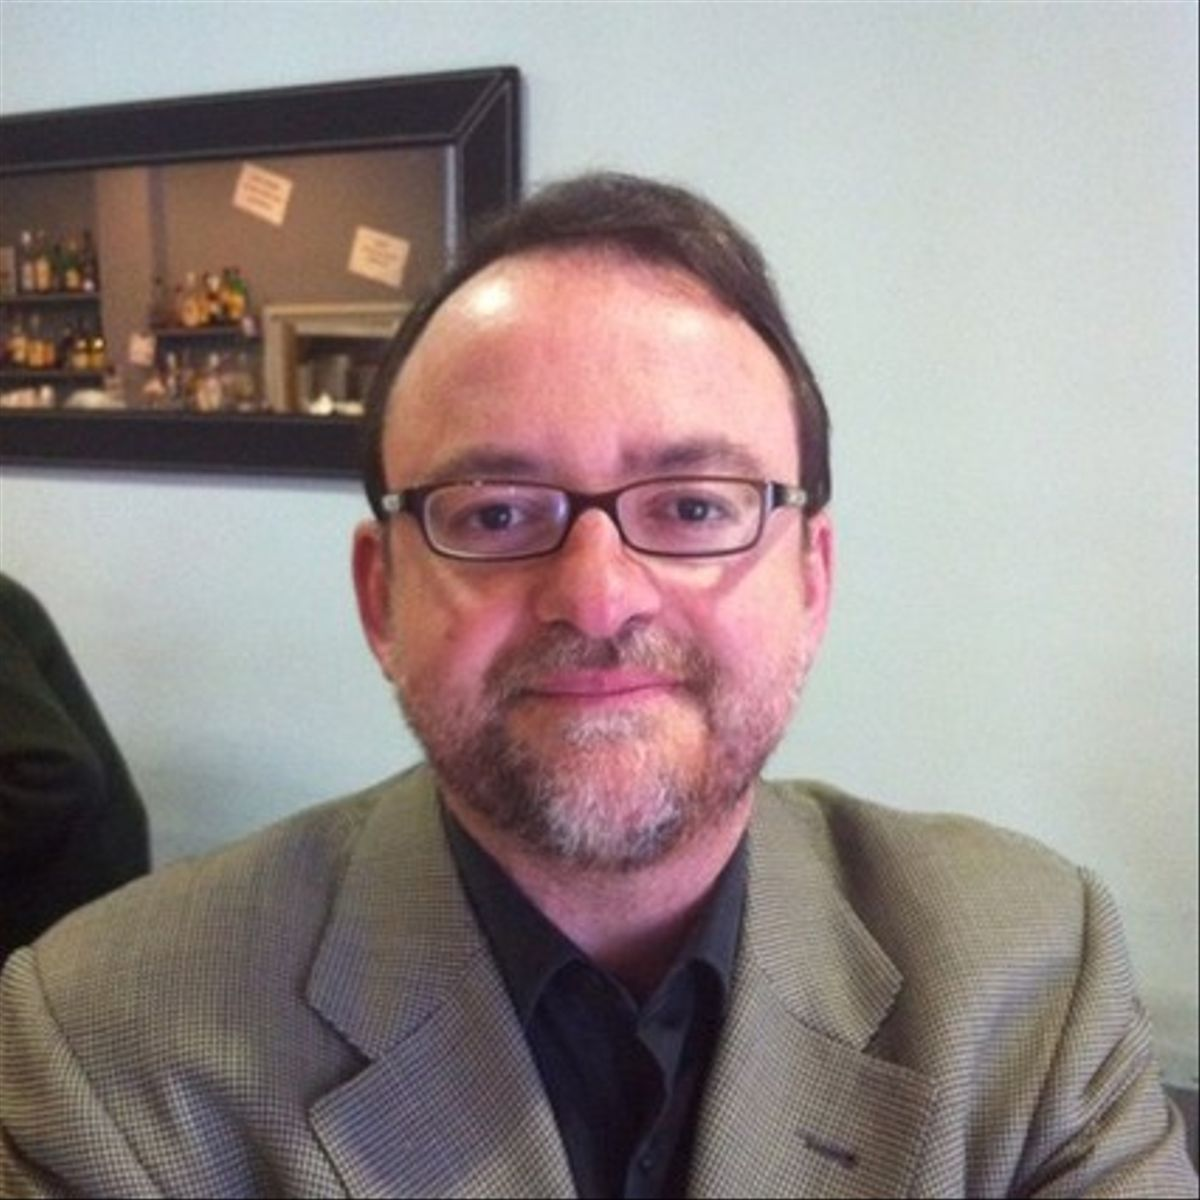 El avatar de Twitter de Daniel Fernández